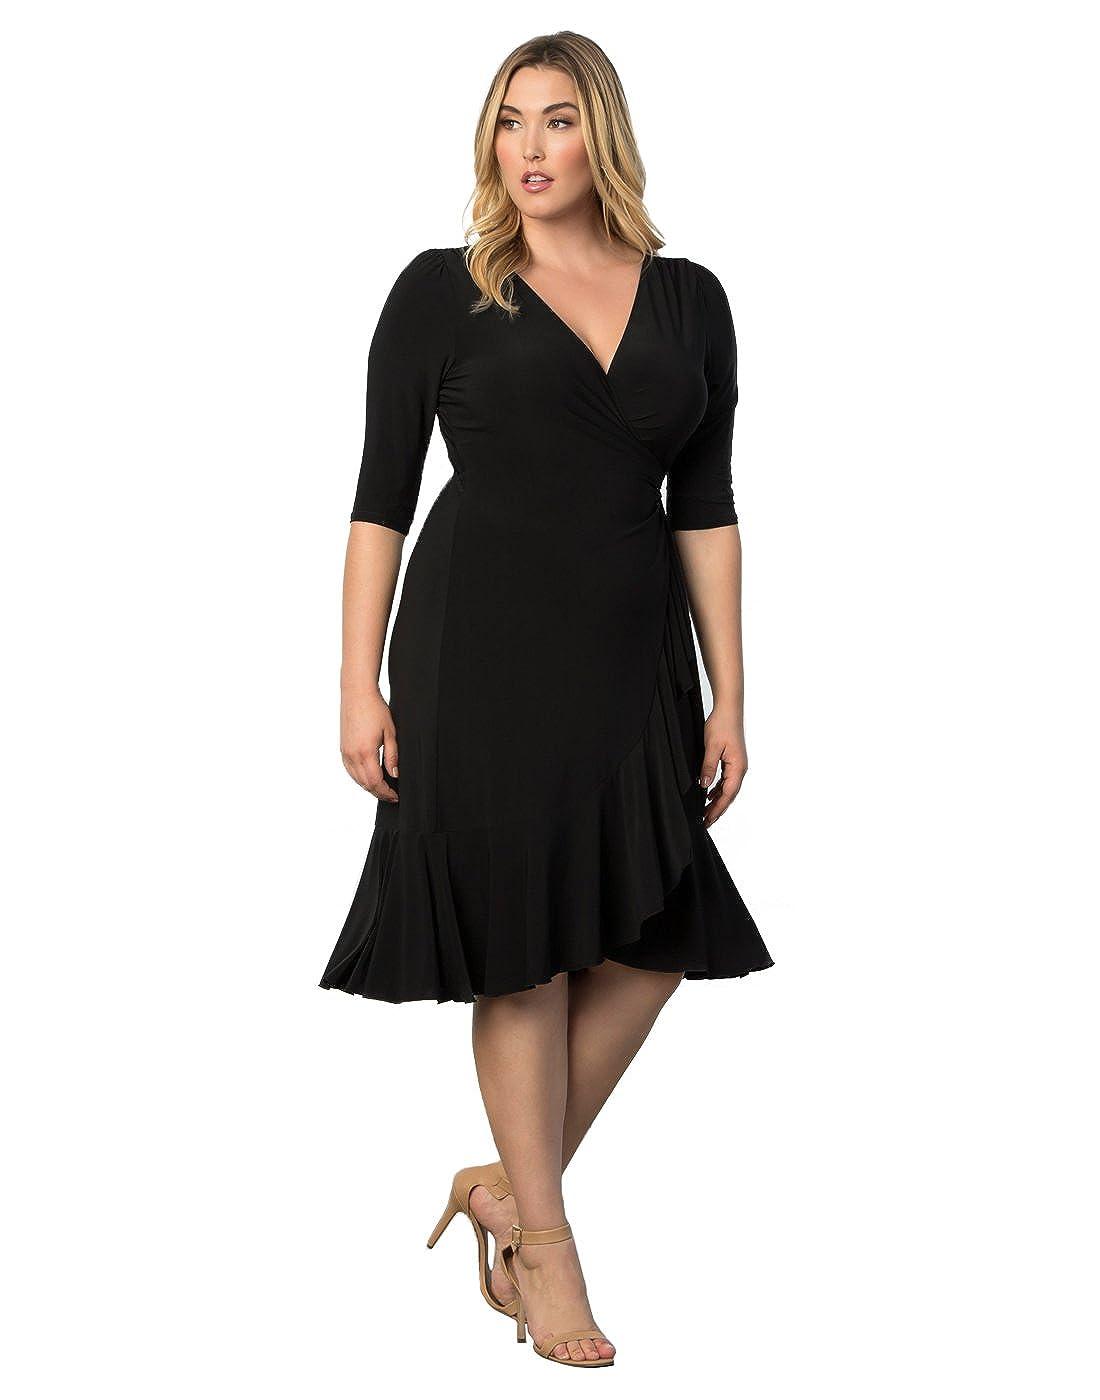 38390a3e0d302 Kiyonna Women's Plus Size Whimsy Wrap Dress at Amazon Women's Clothing  store: